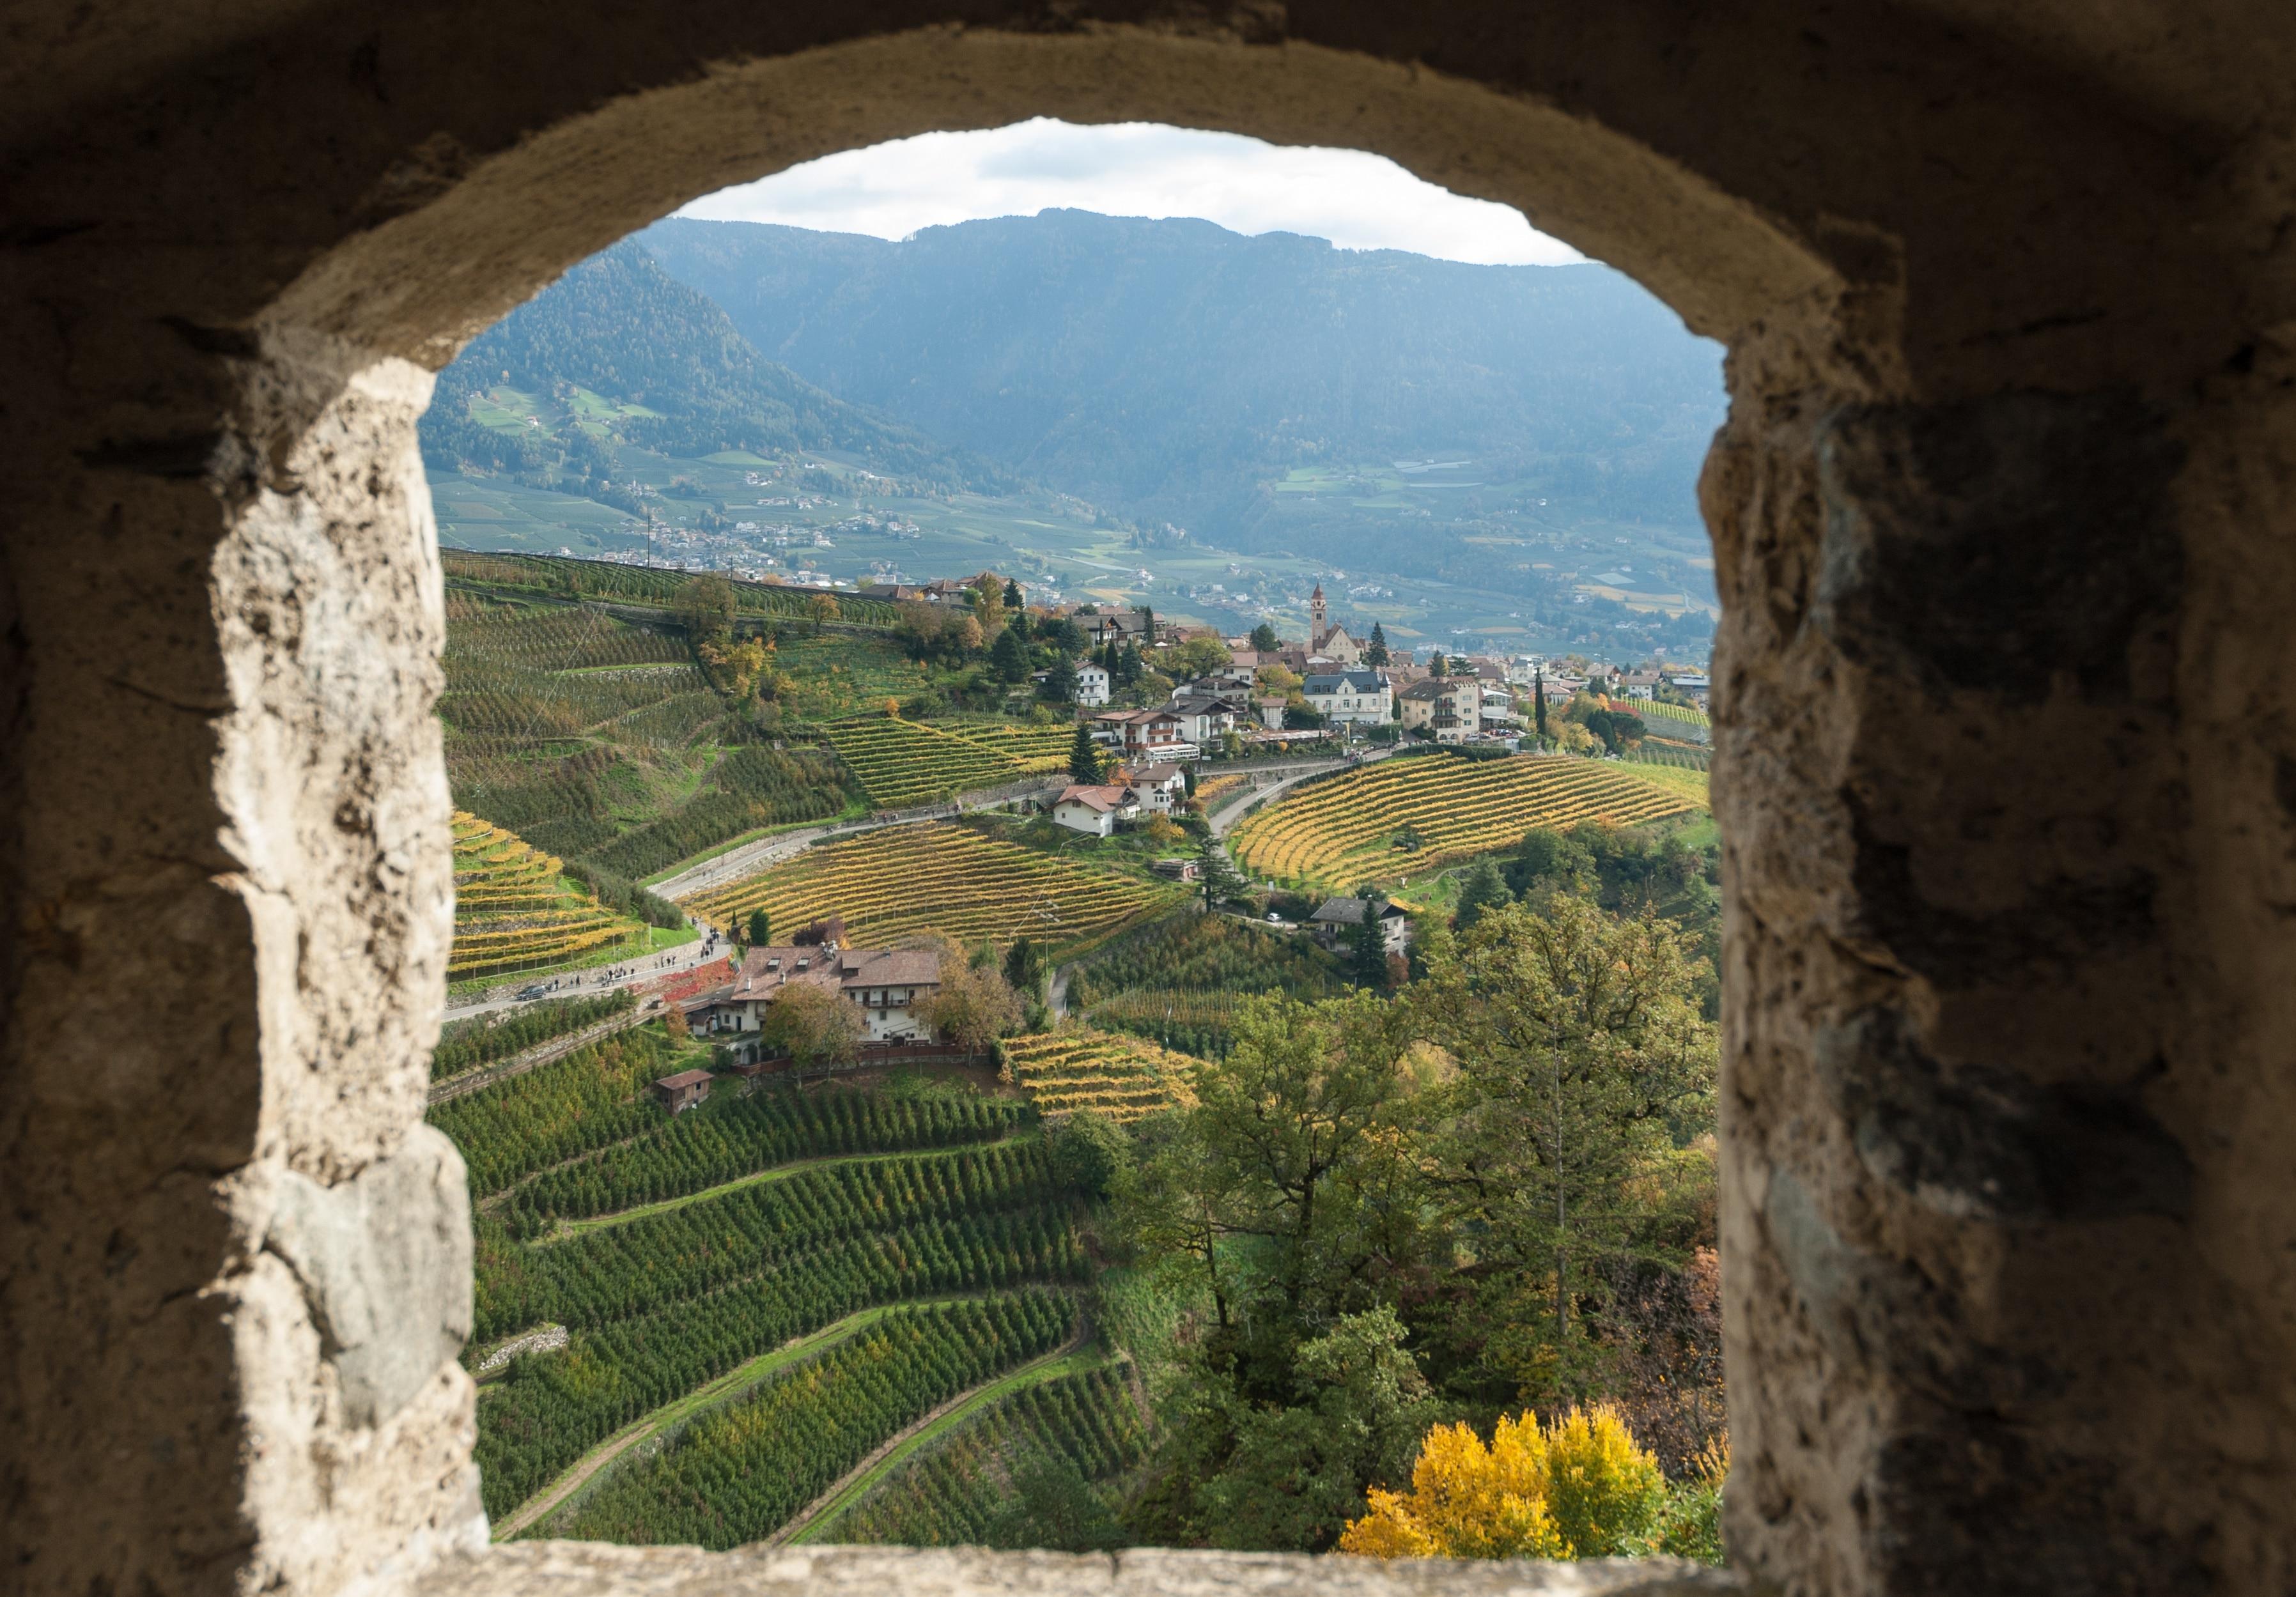 Tirol Castle, Tirolo, Trentino-Alto Adige, Italy